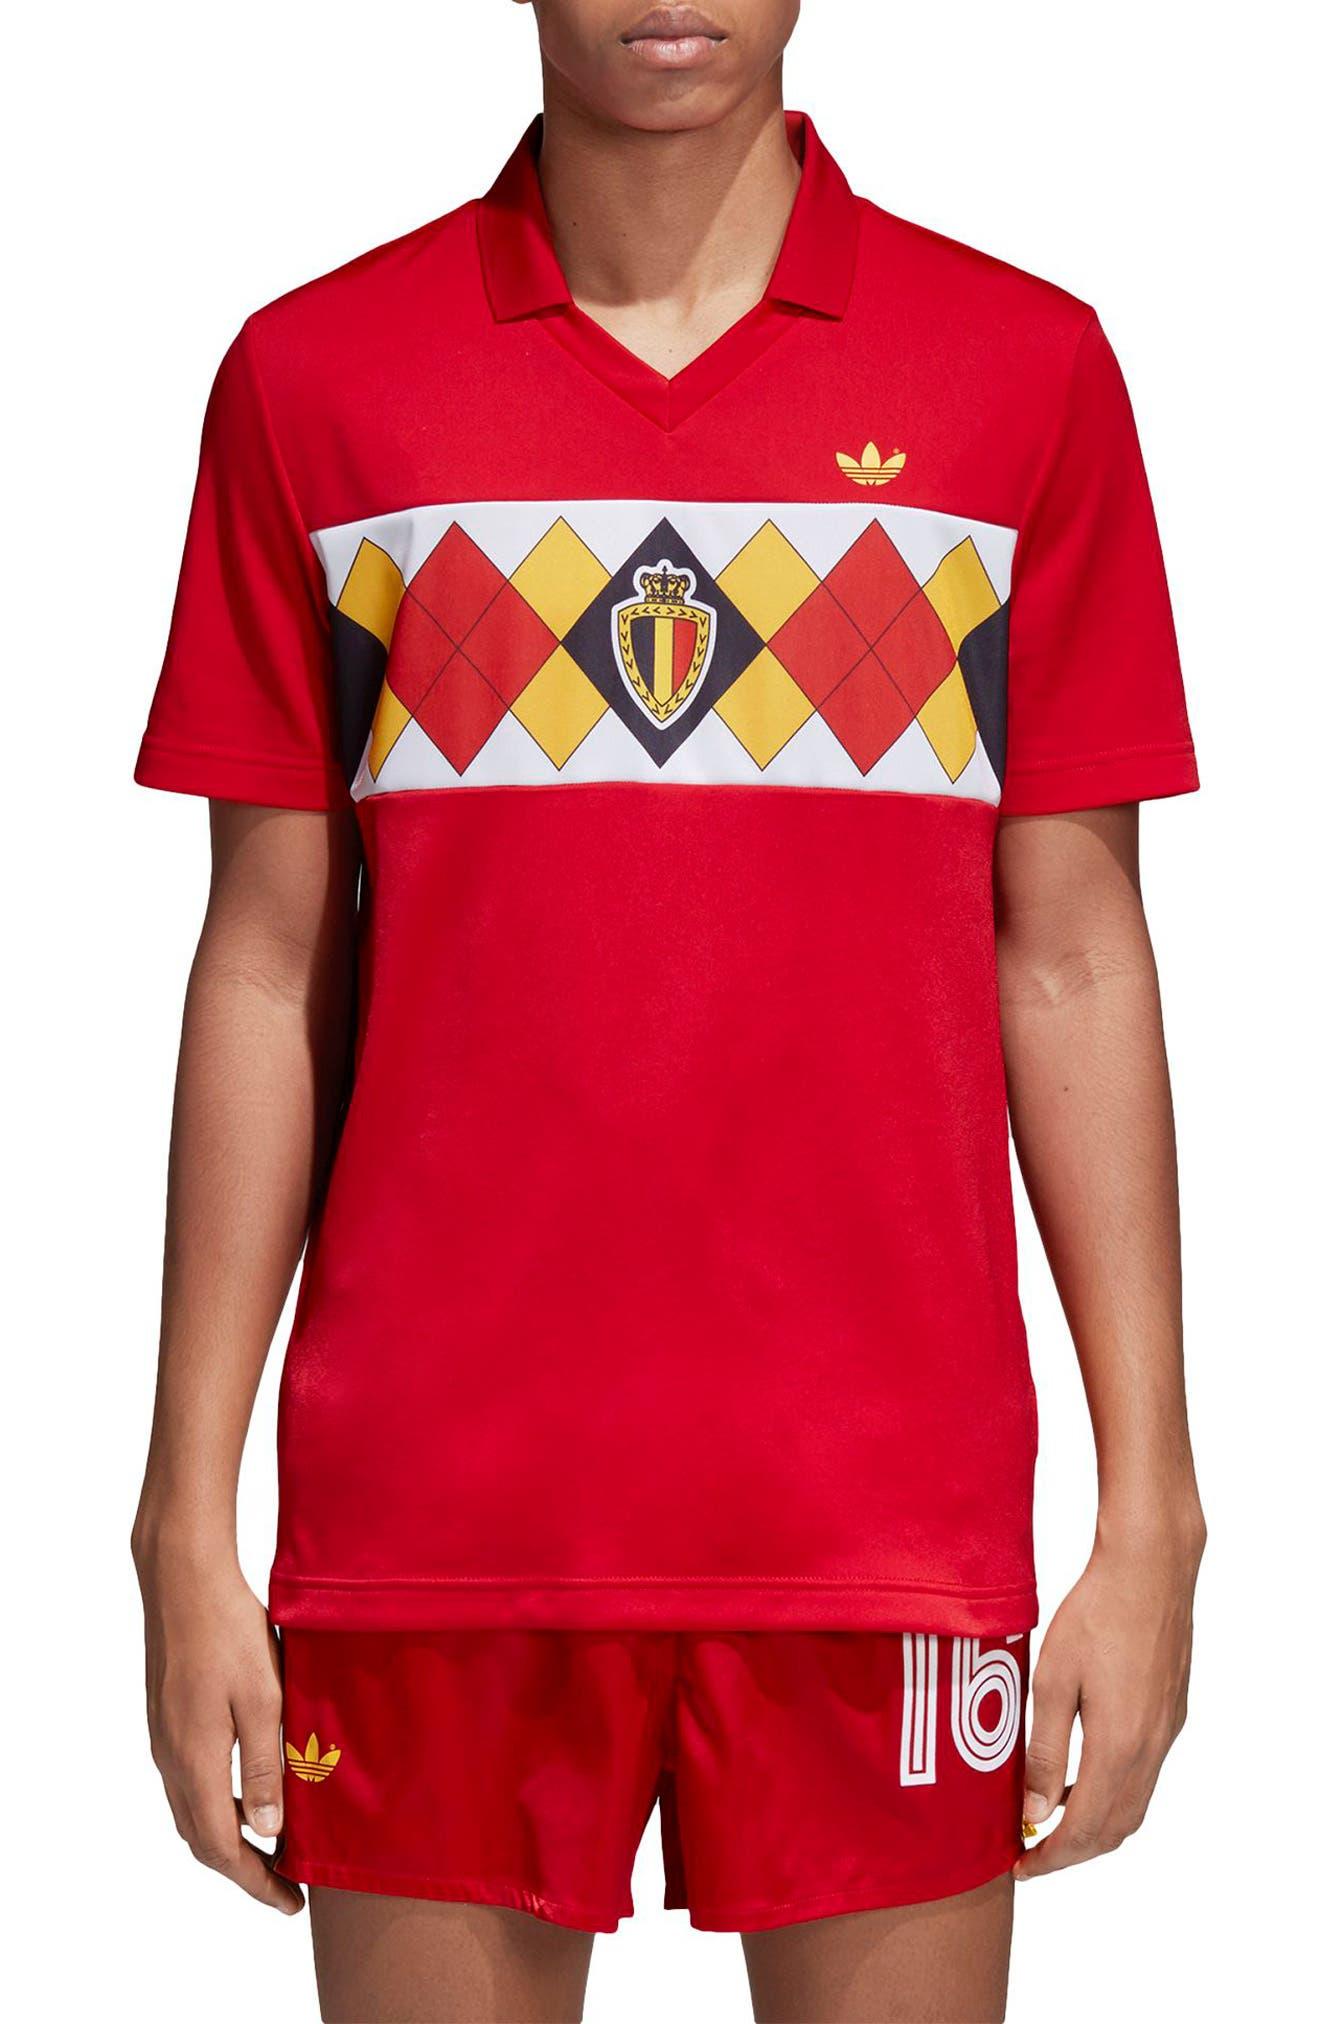 adidas Original Belgium 1984 Soccer Jersey,                             Main thumbnail 1, color,                             Vicred